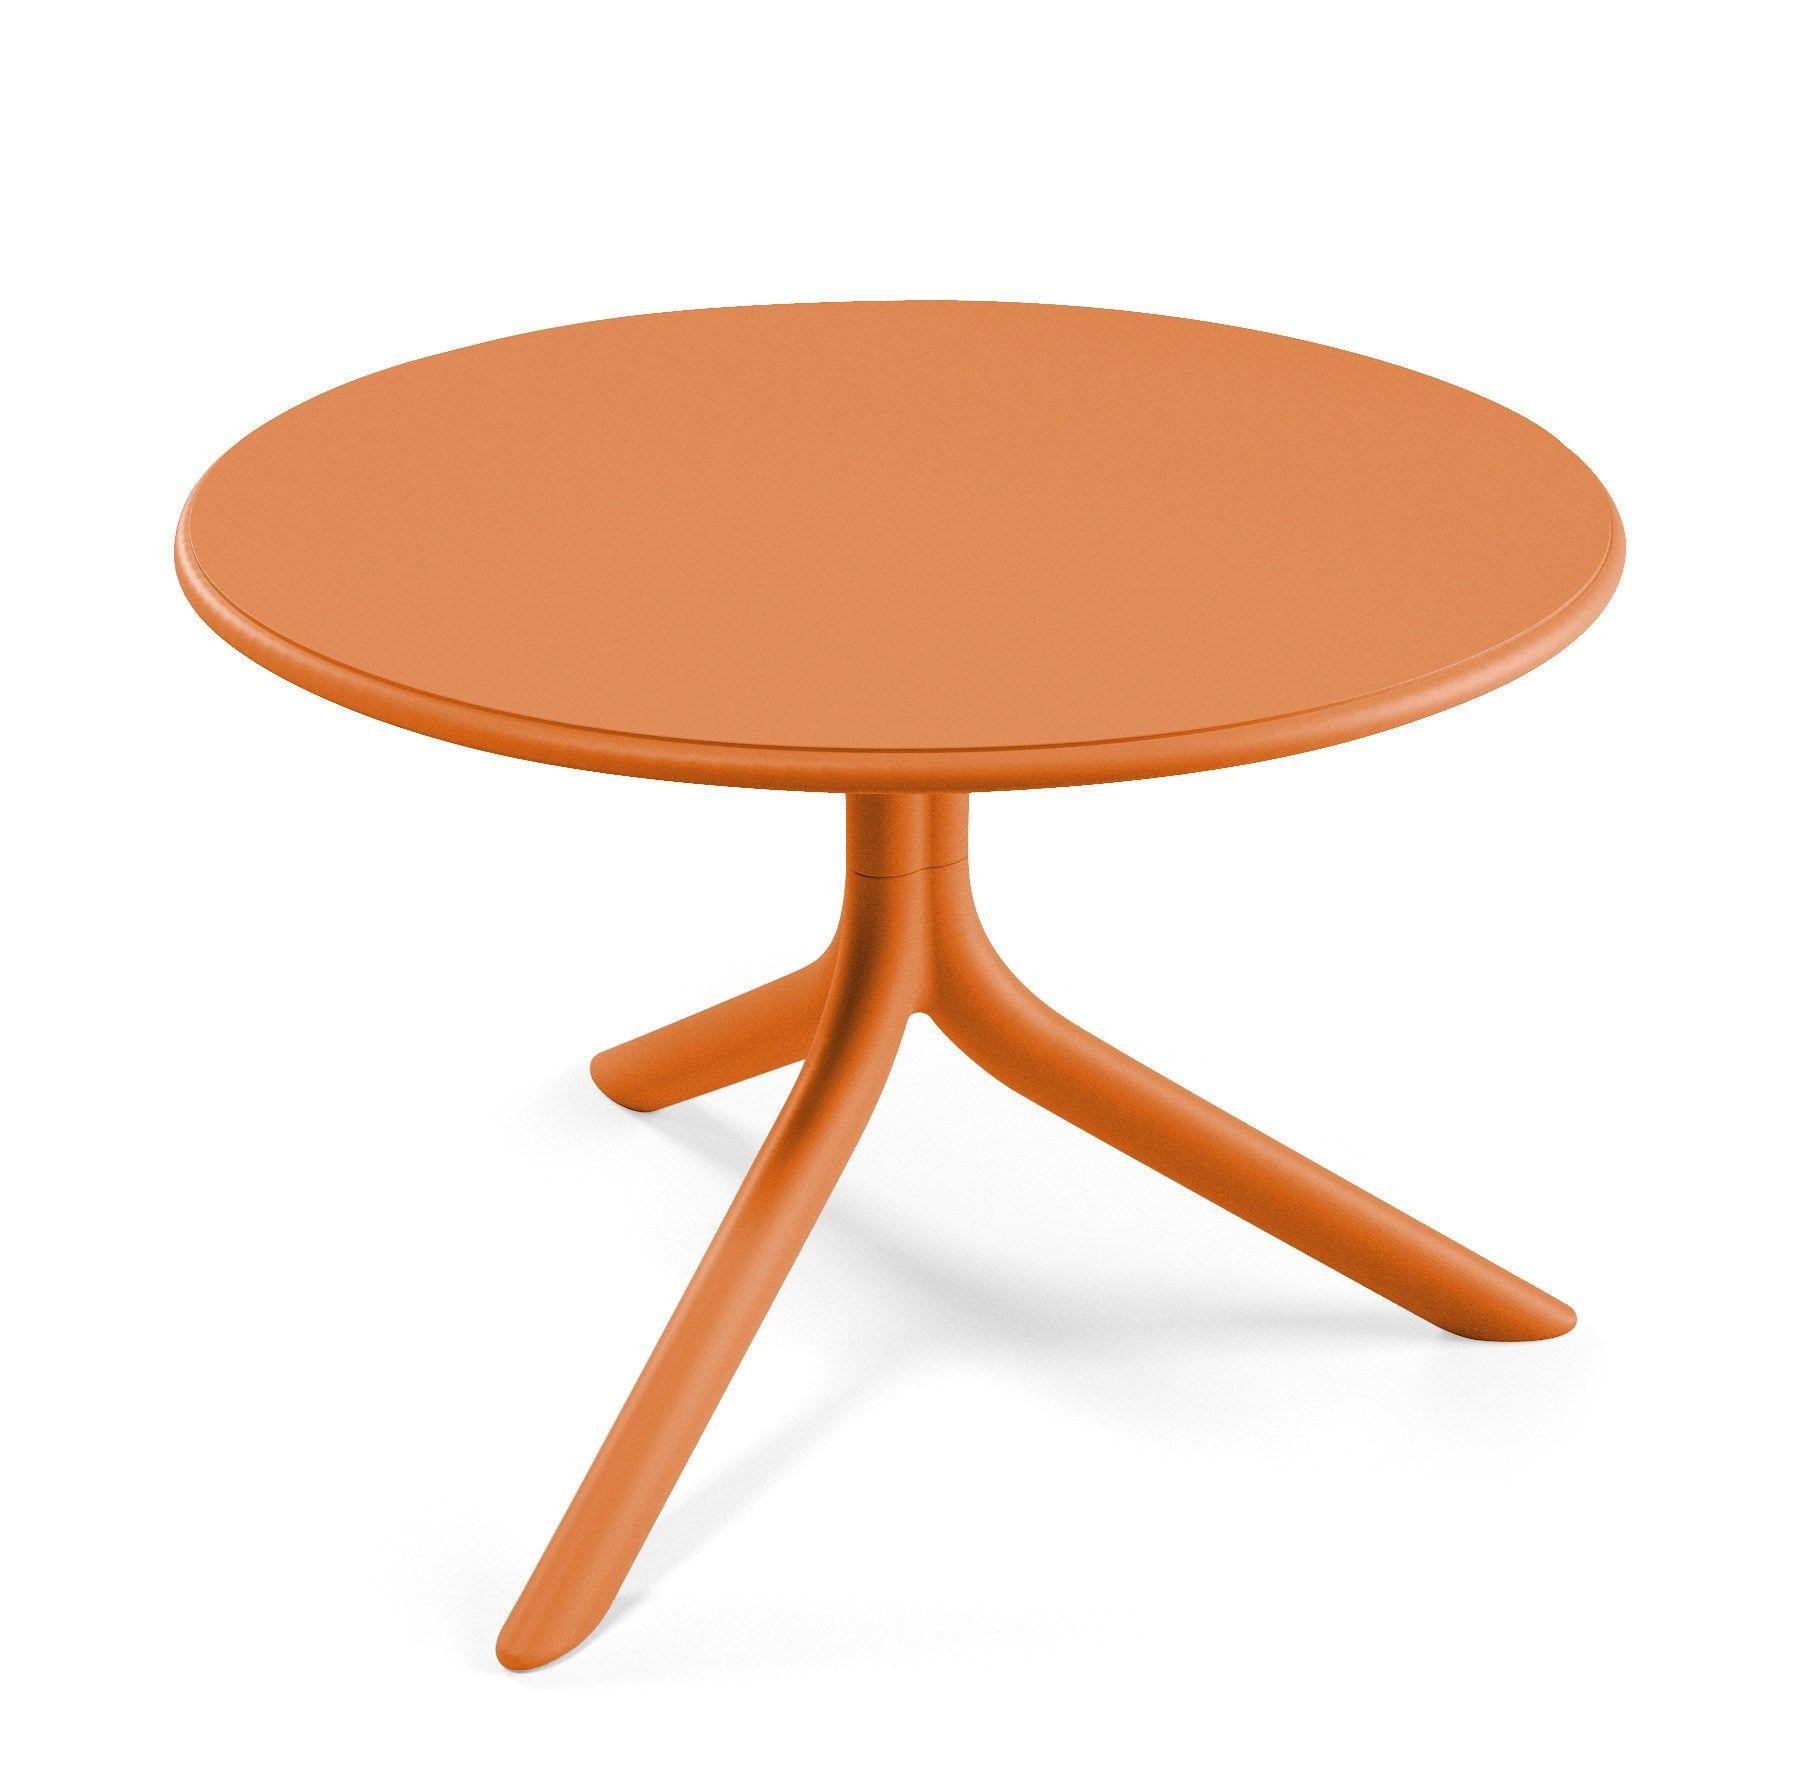 Low Plastic Coffee Table: LOW GARDEN SIDE TABLE SPRITZ MINI